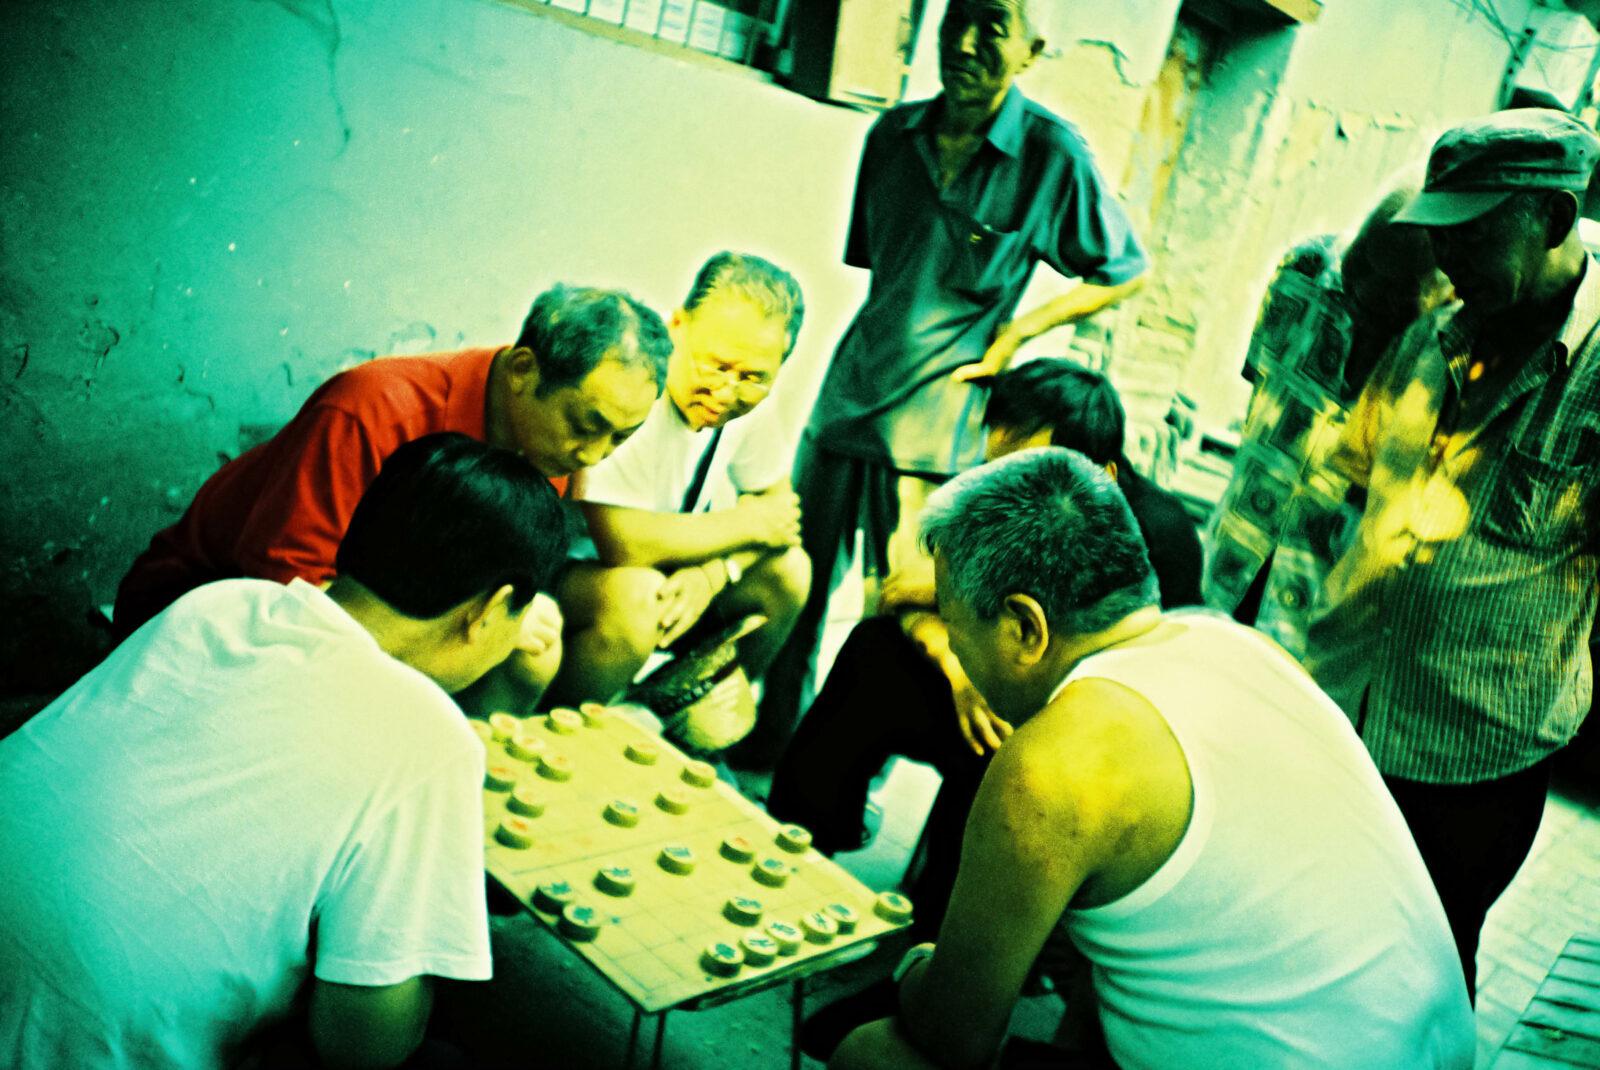 instaCDV 15 China roll04 BeijingHutong 000042